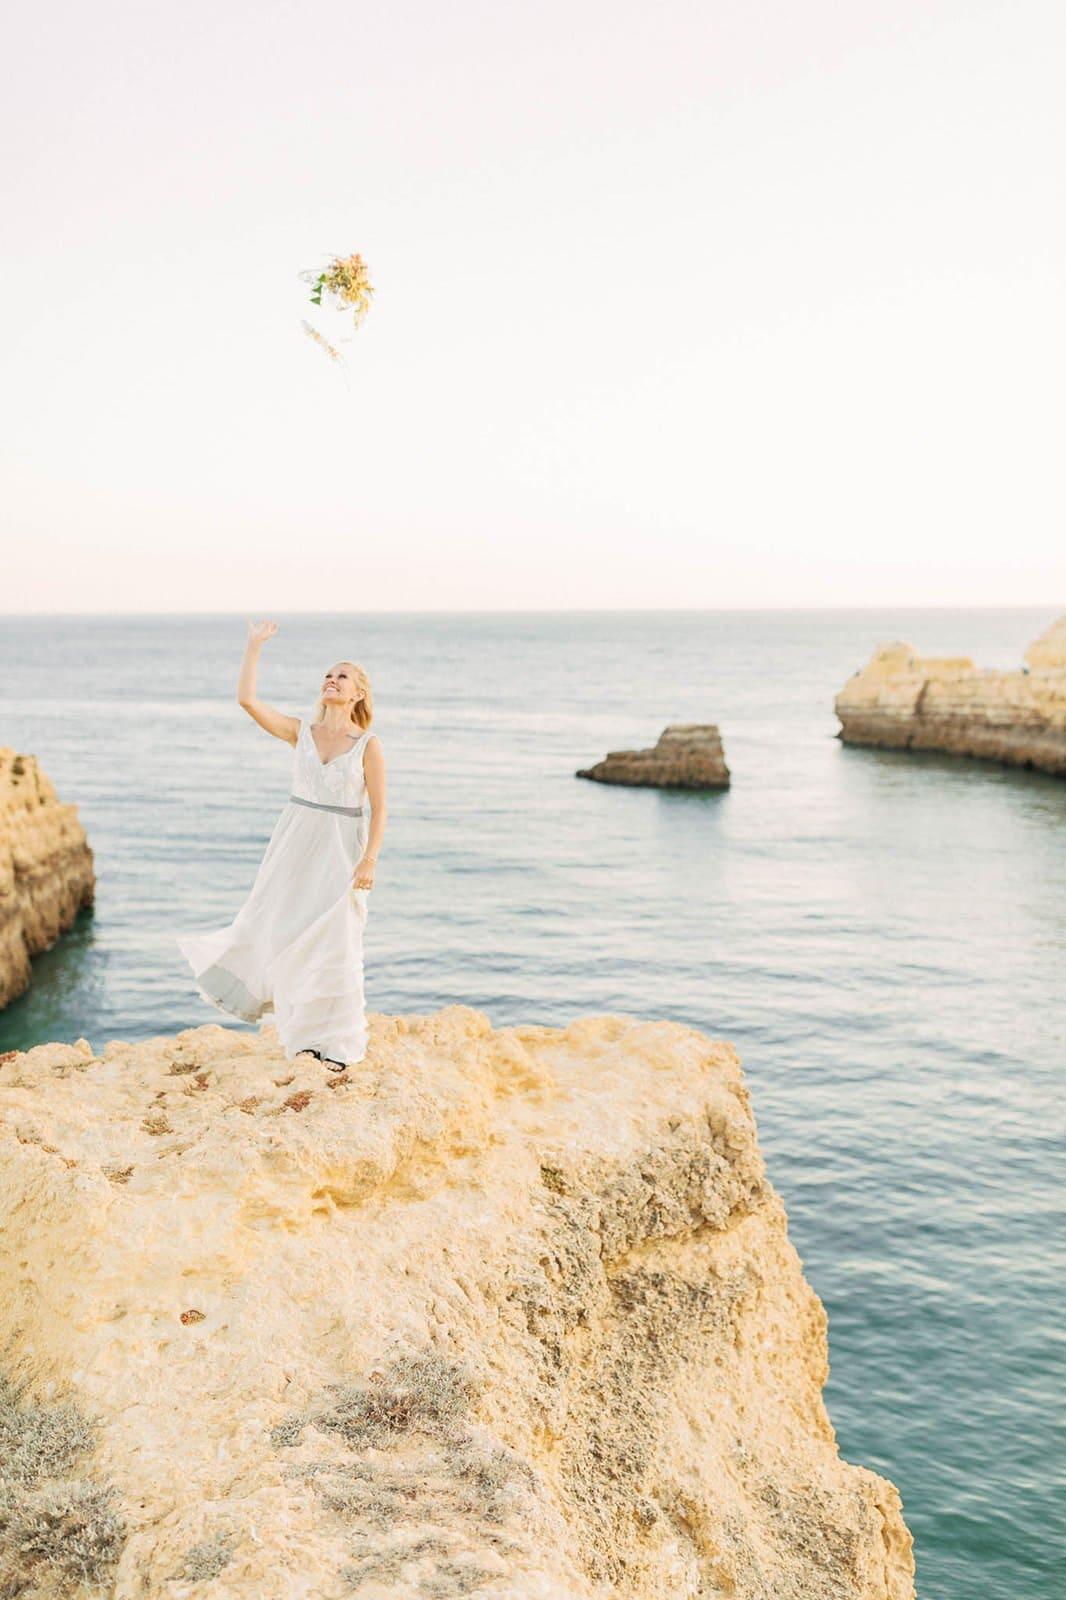 bride throwing her bouquet into the ocean